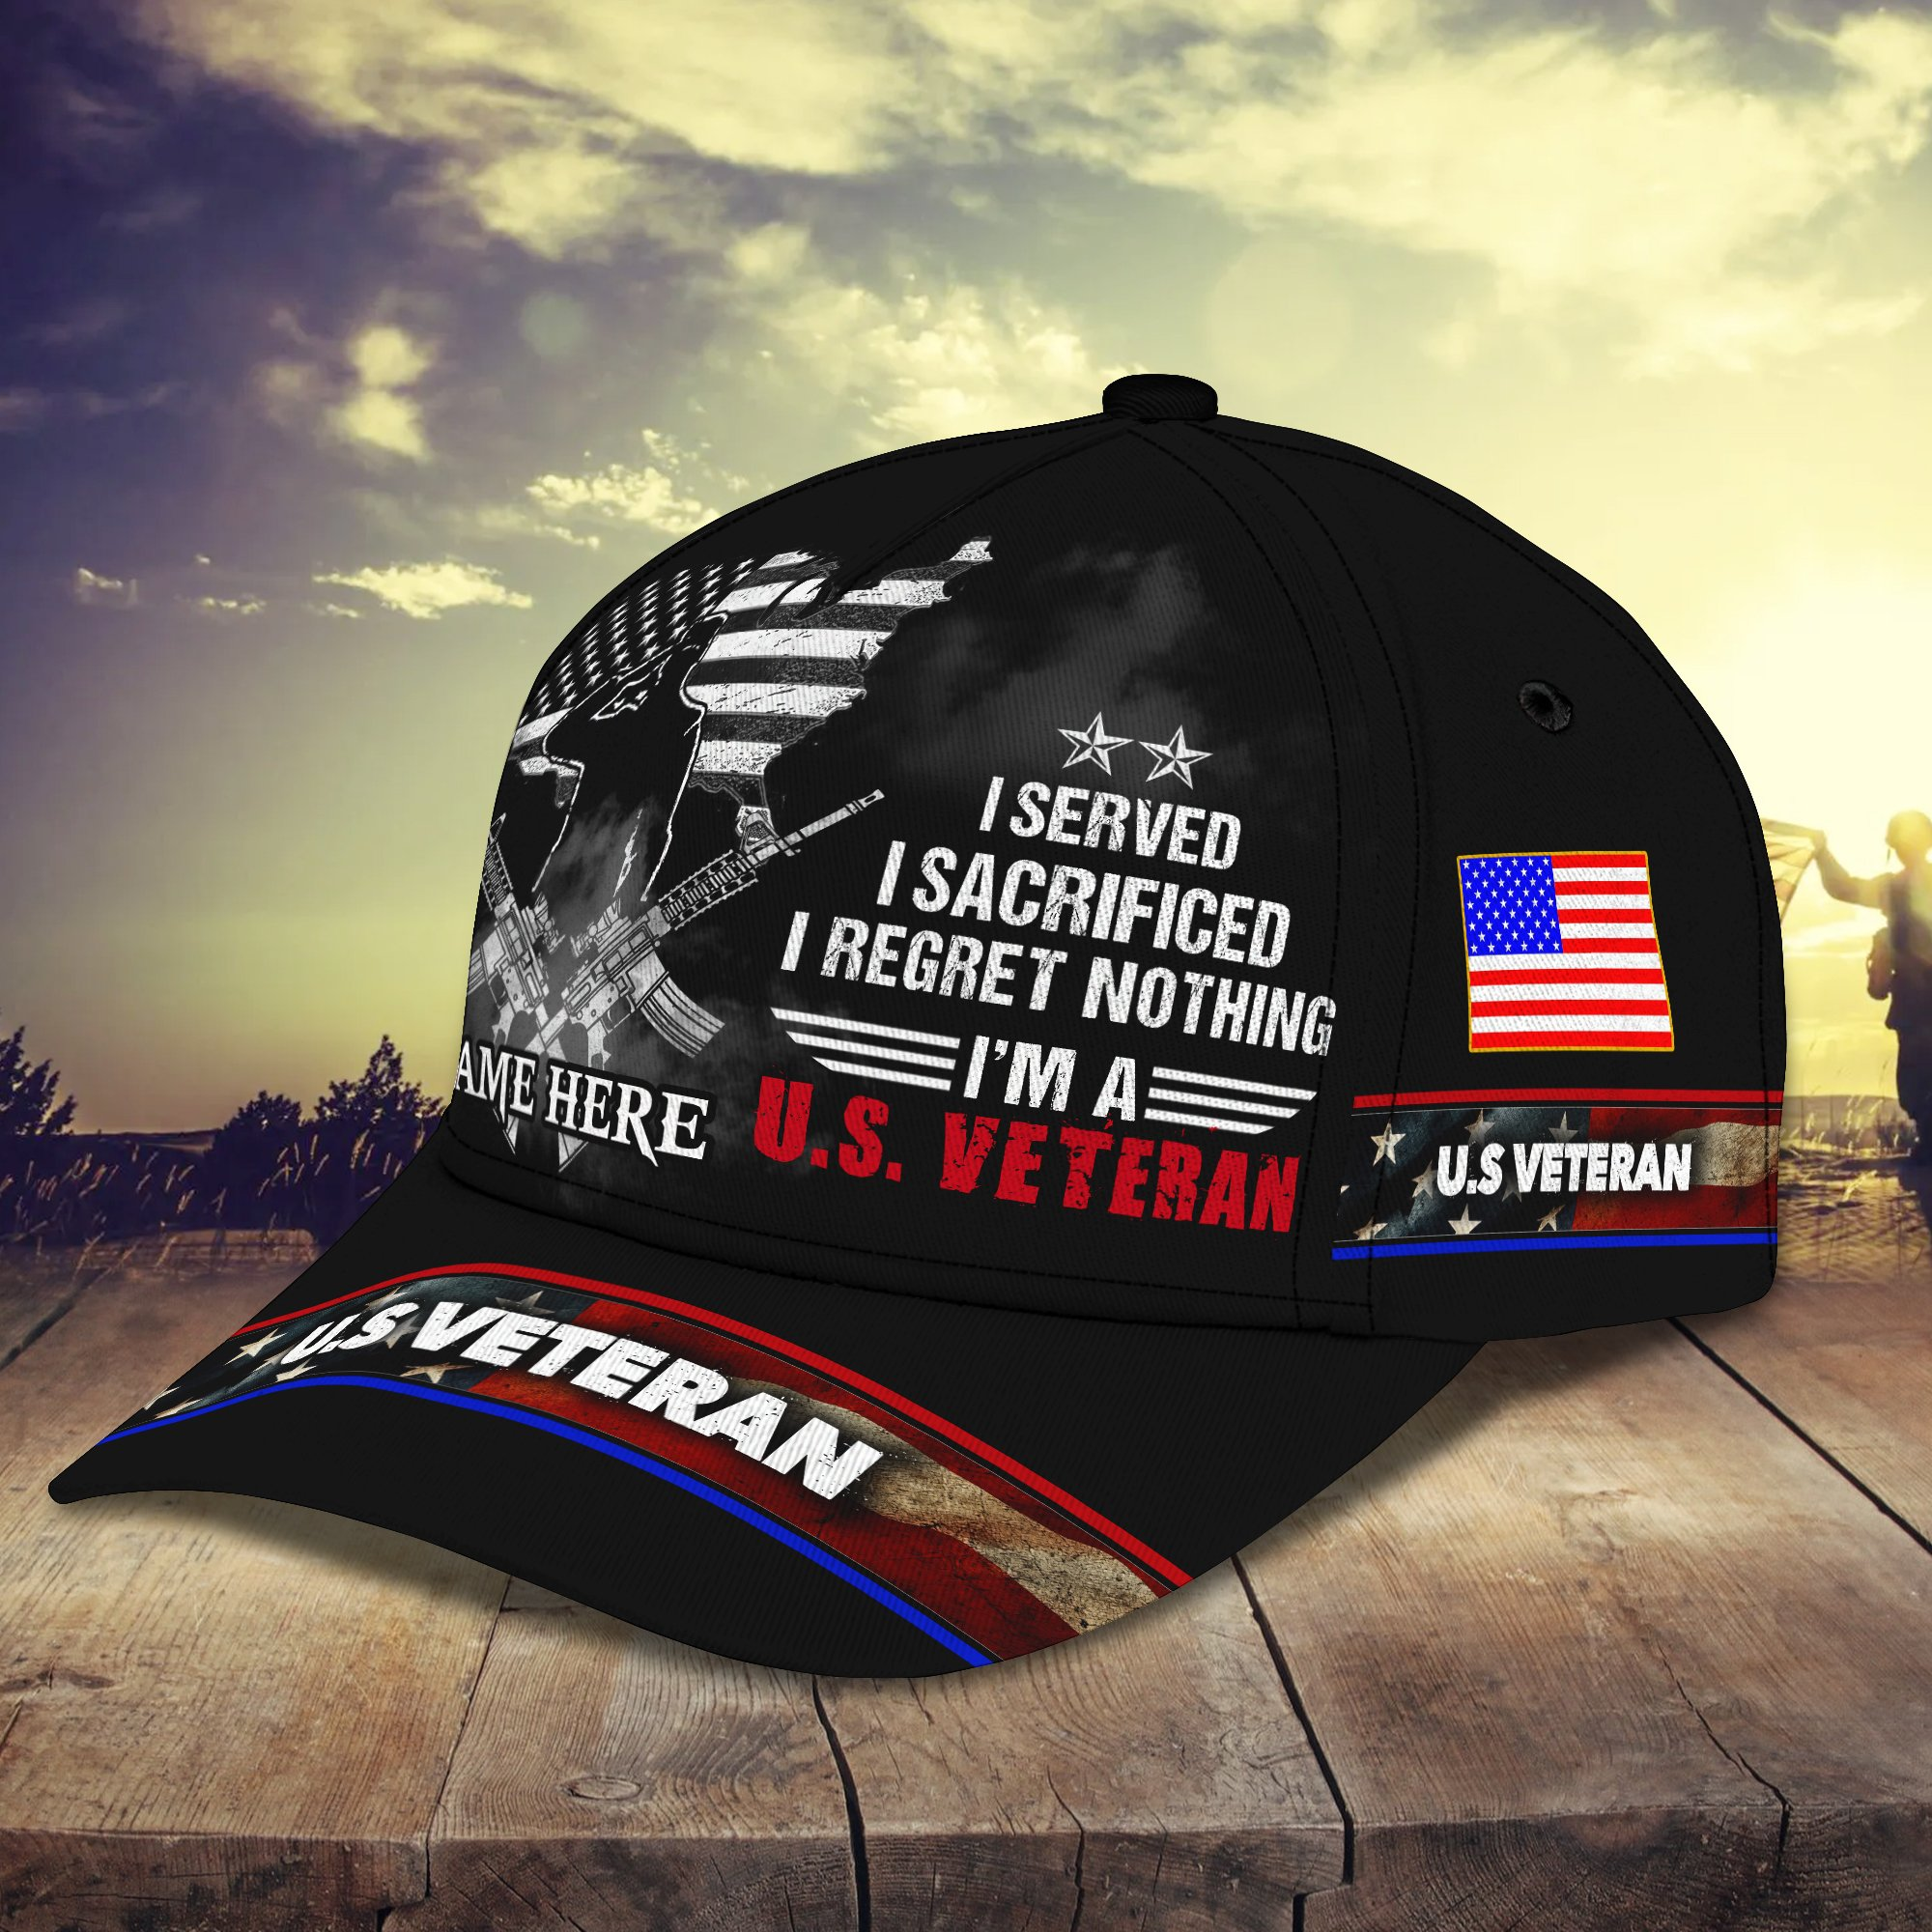 US Veteran I Served I Sacrificed I Reget Nothing Personalized Hat Cap